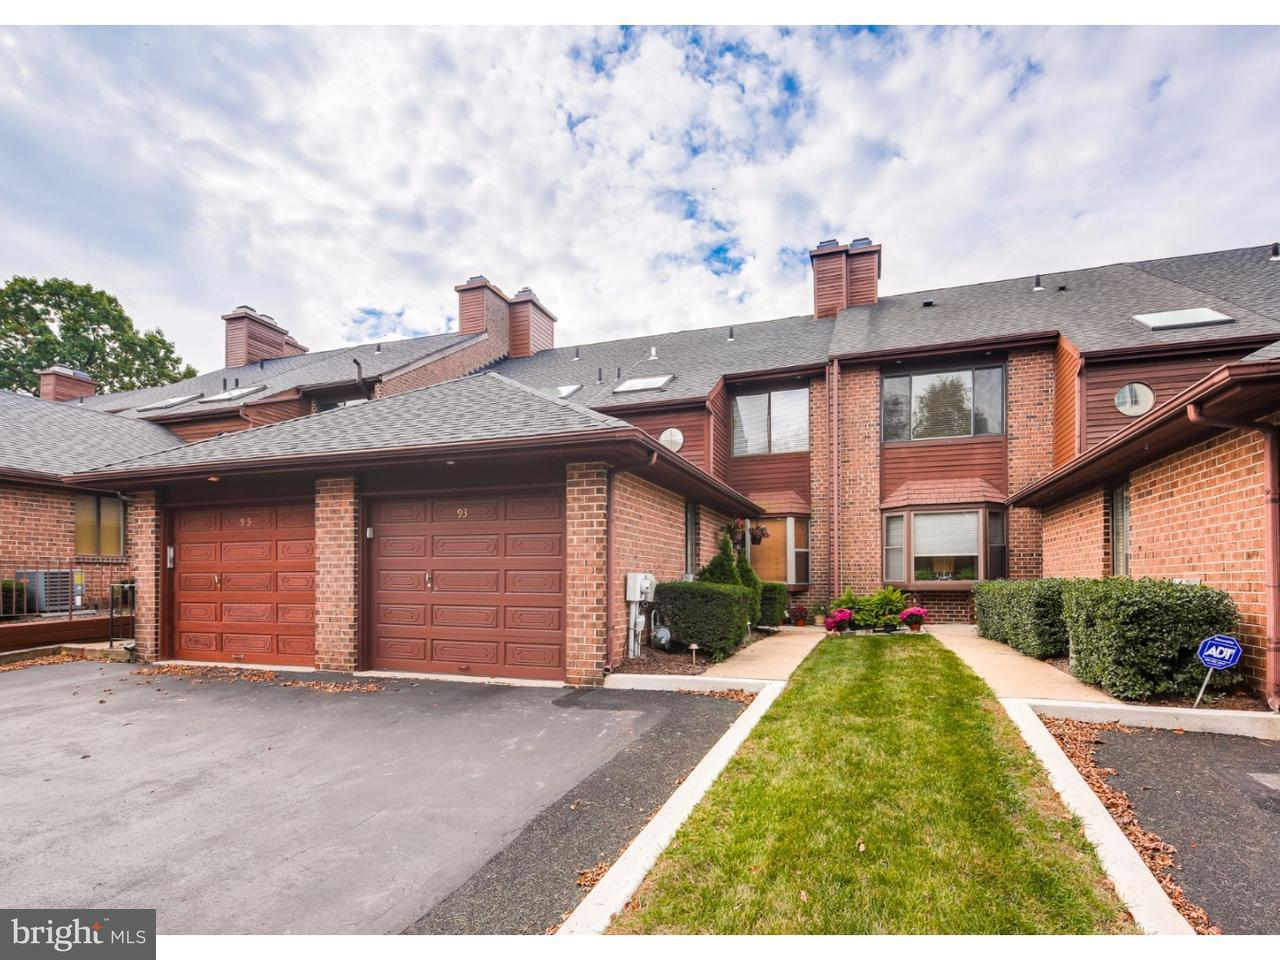 Condominium for Sale at 93 TIMOTHY Circle Radnor, Pennsylvania 19087 United States